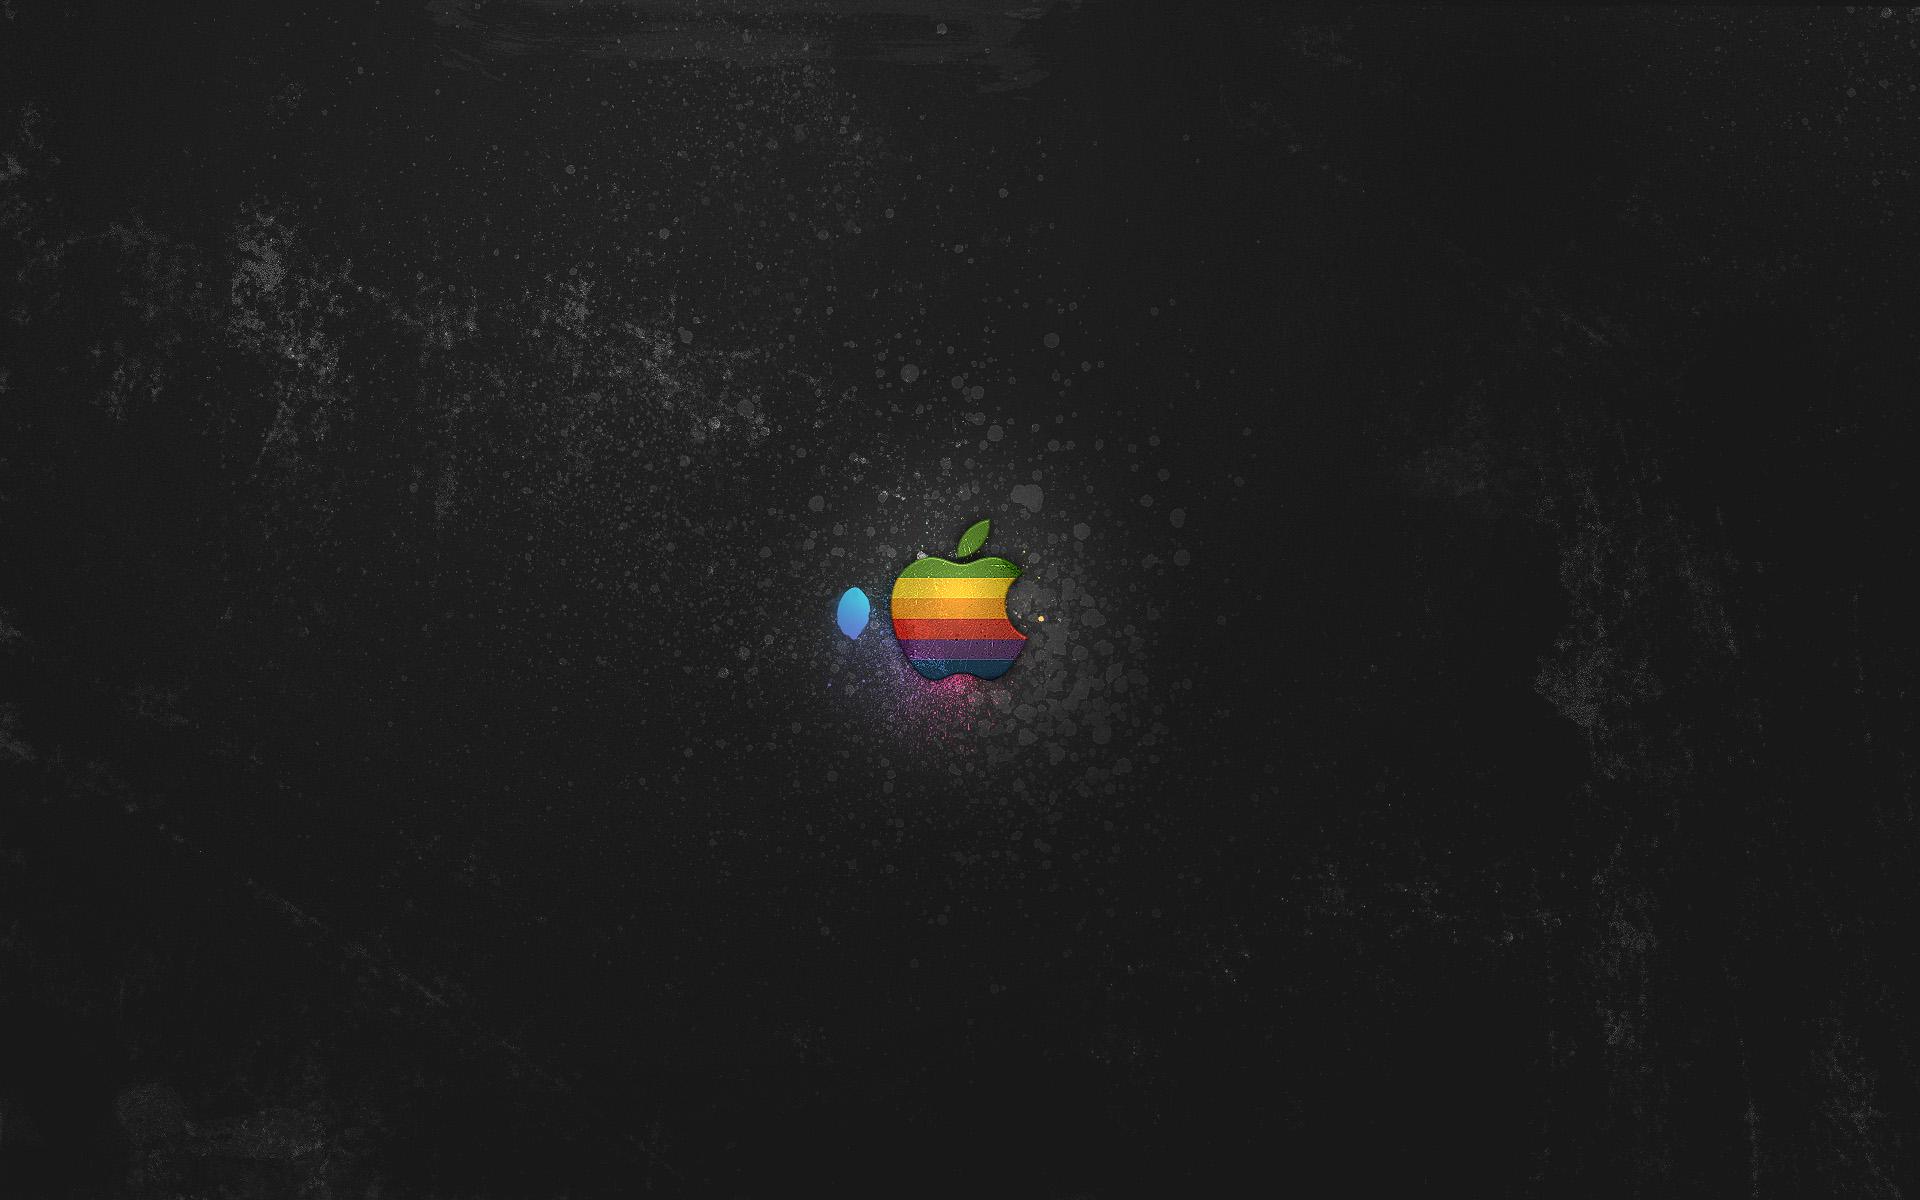 Sfondi Natalizi Apple.Sfondi Apple Sfondissimo Sfondi Screensaver Gratis